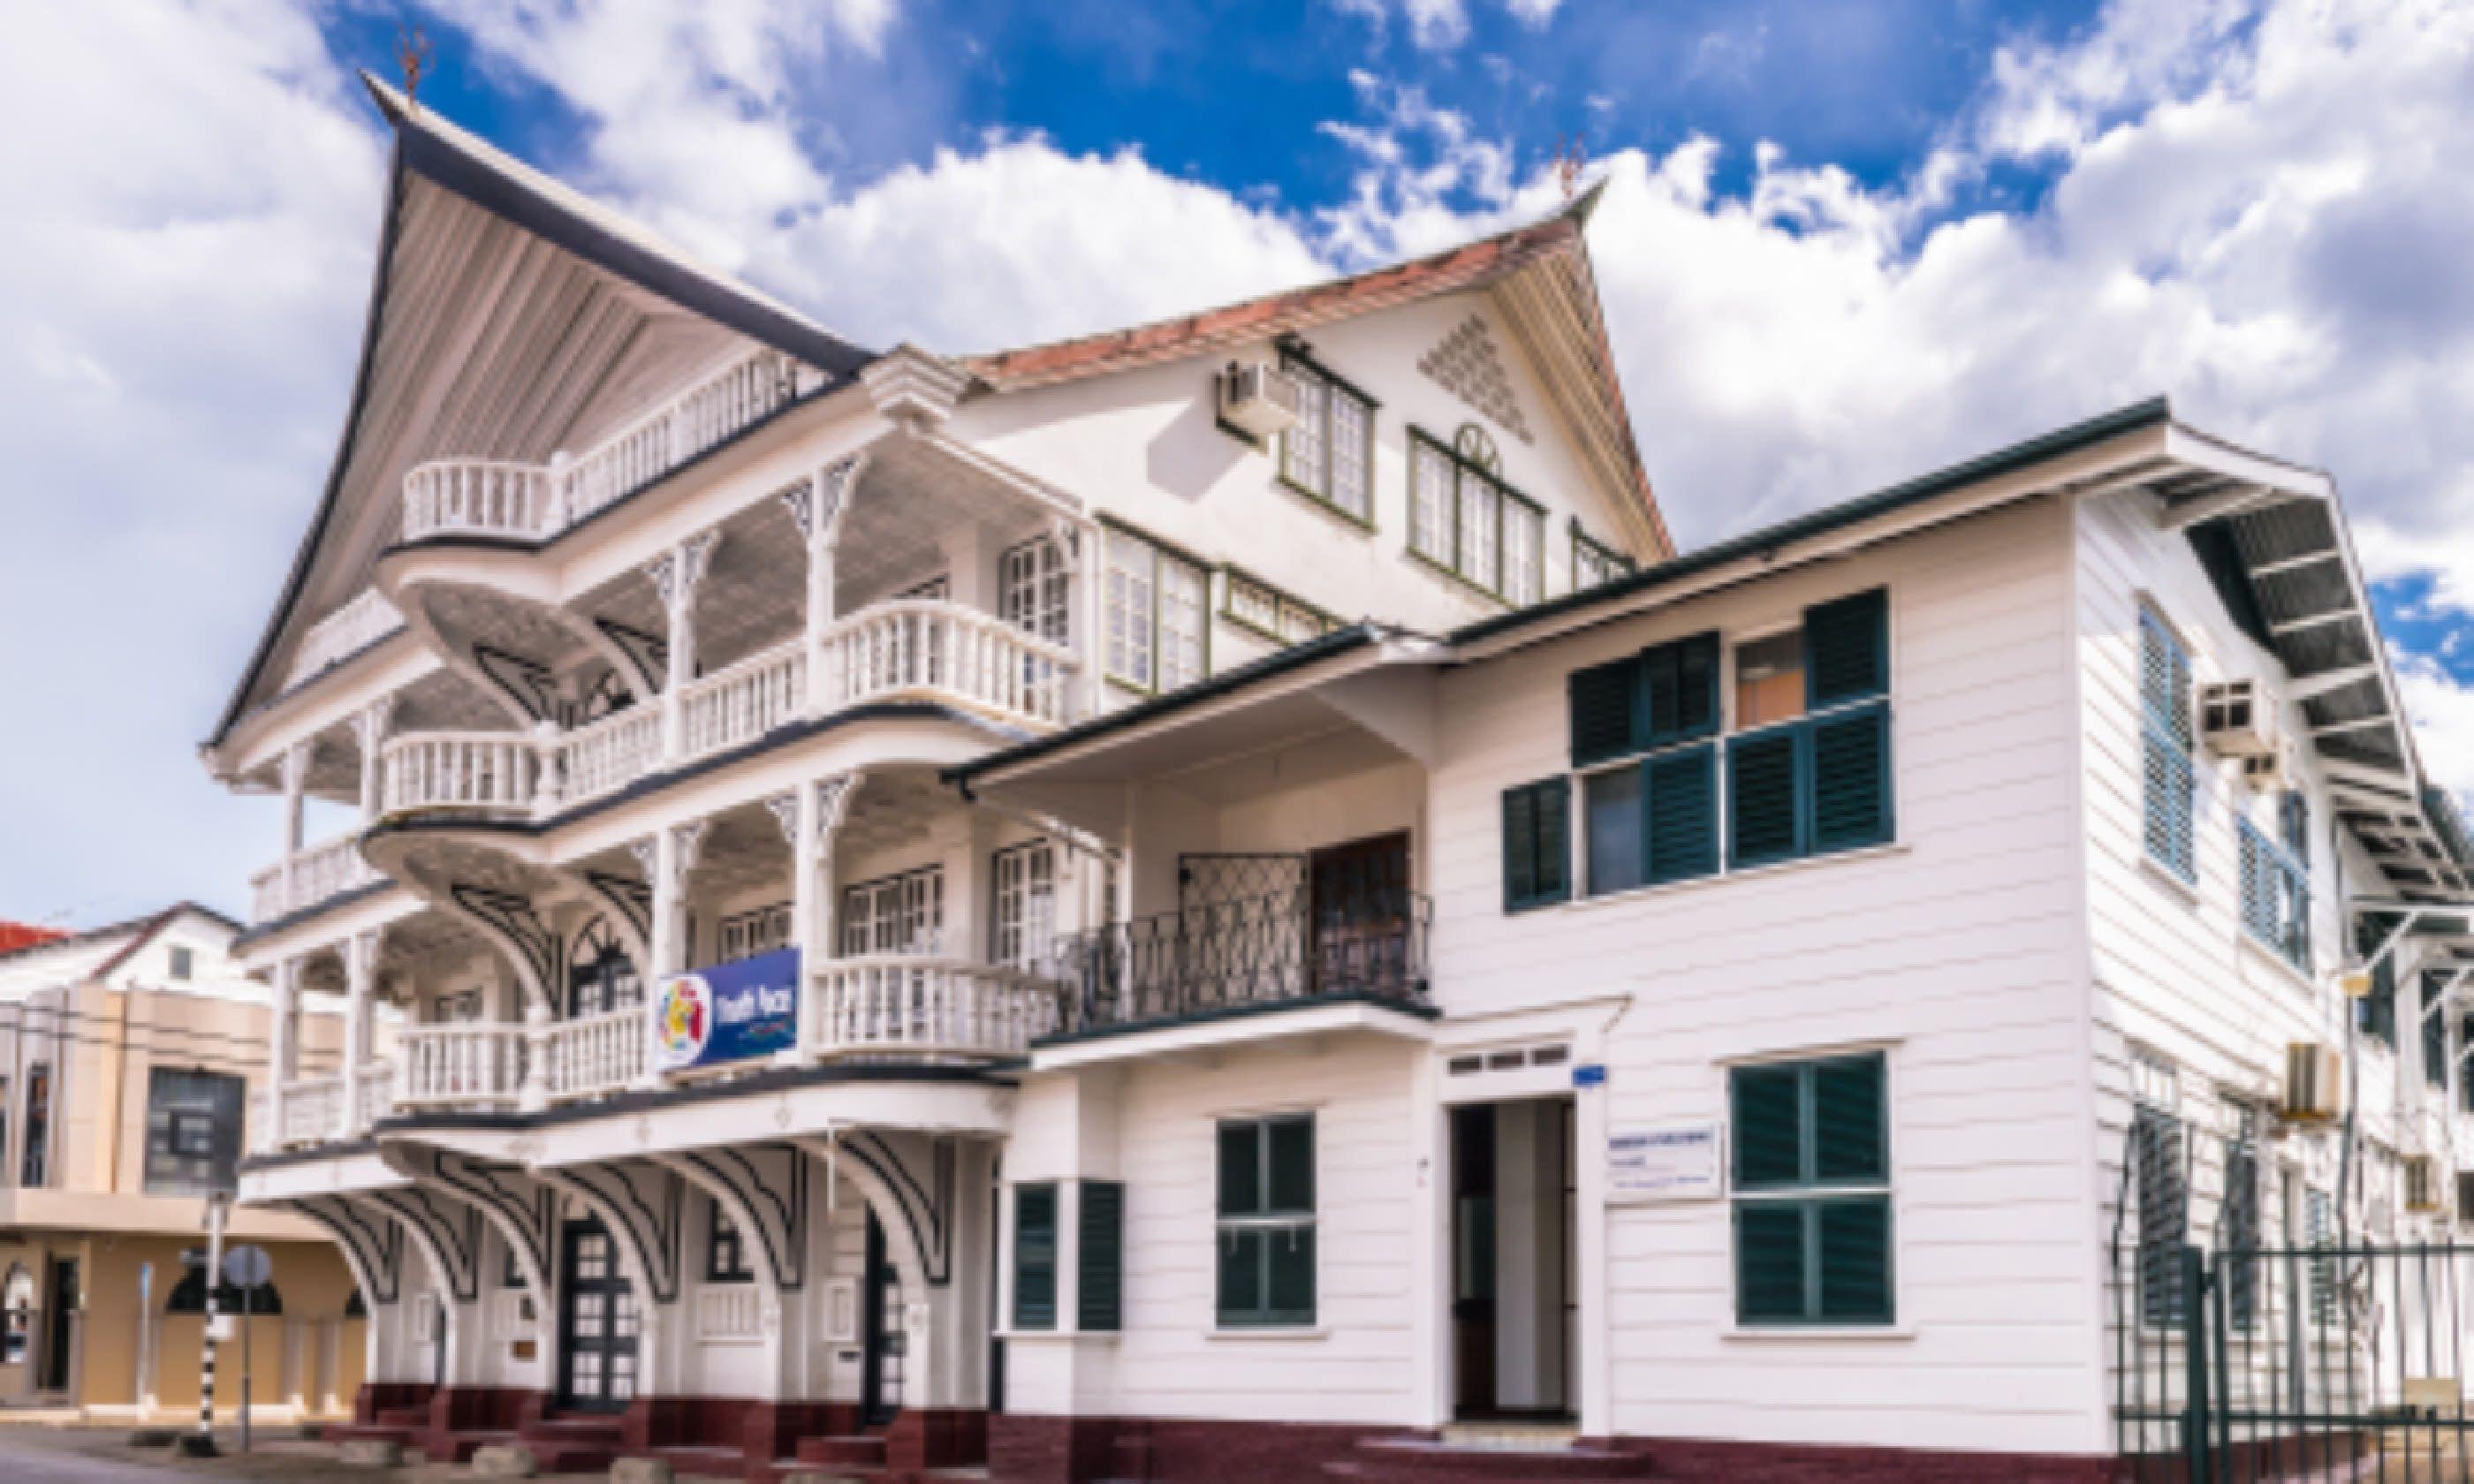 Paramaribo, Suriname (Shutterstock)